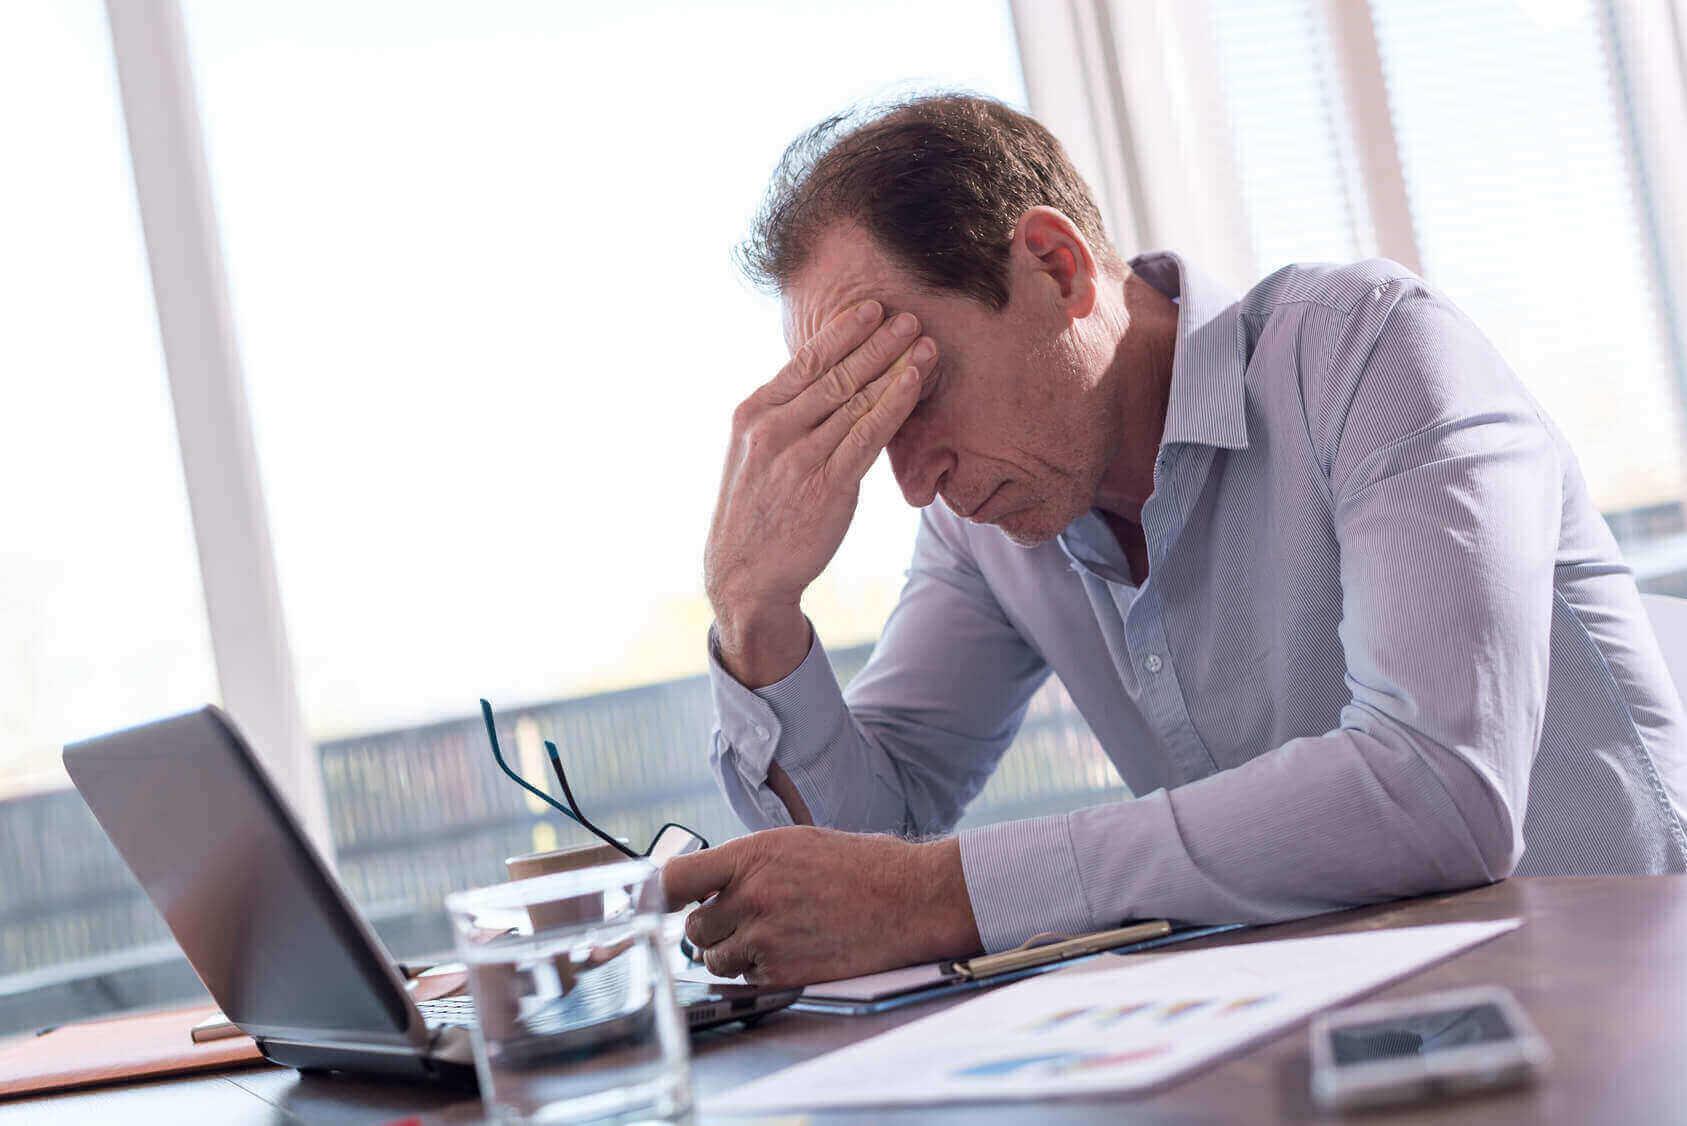 Burnout im Büro